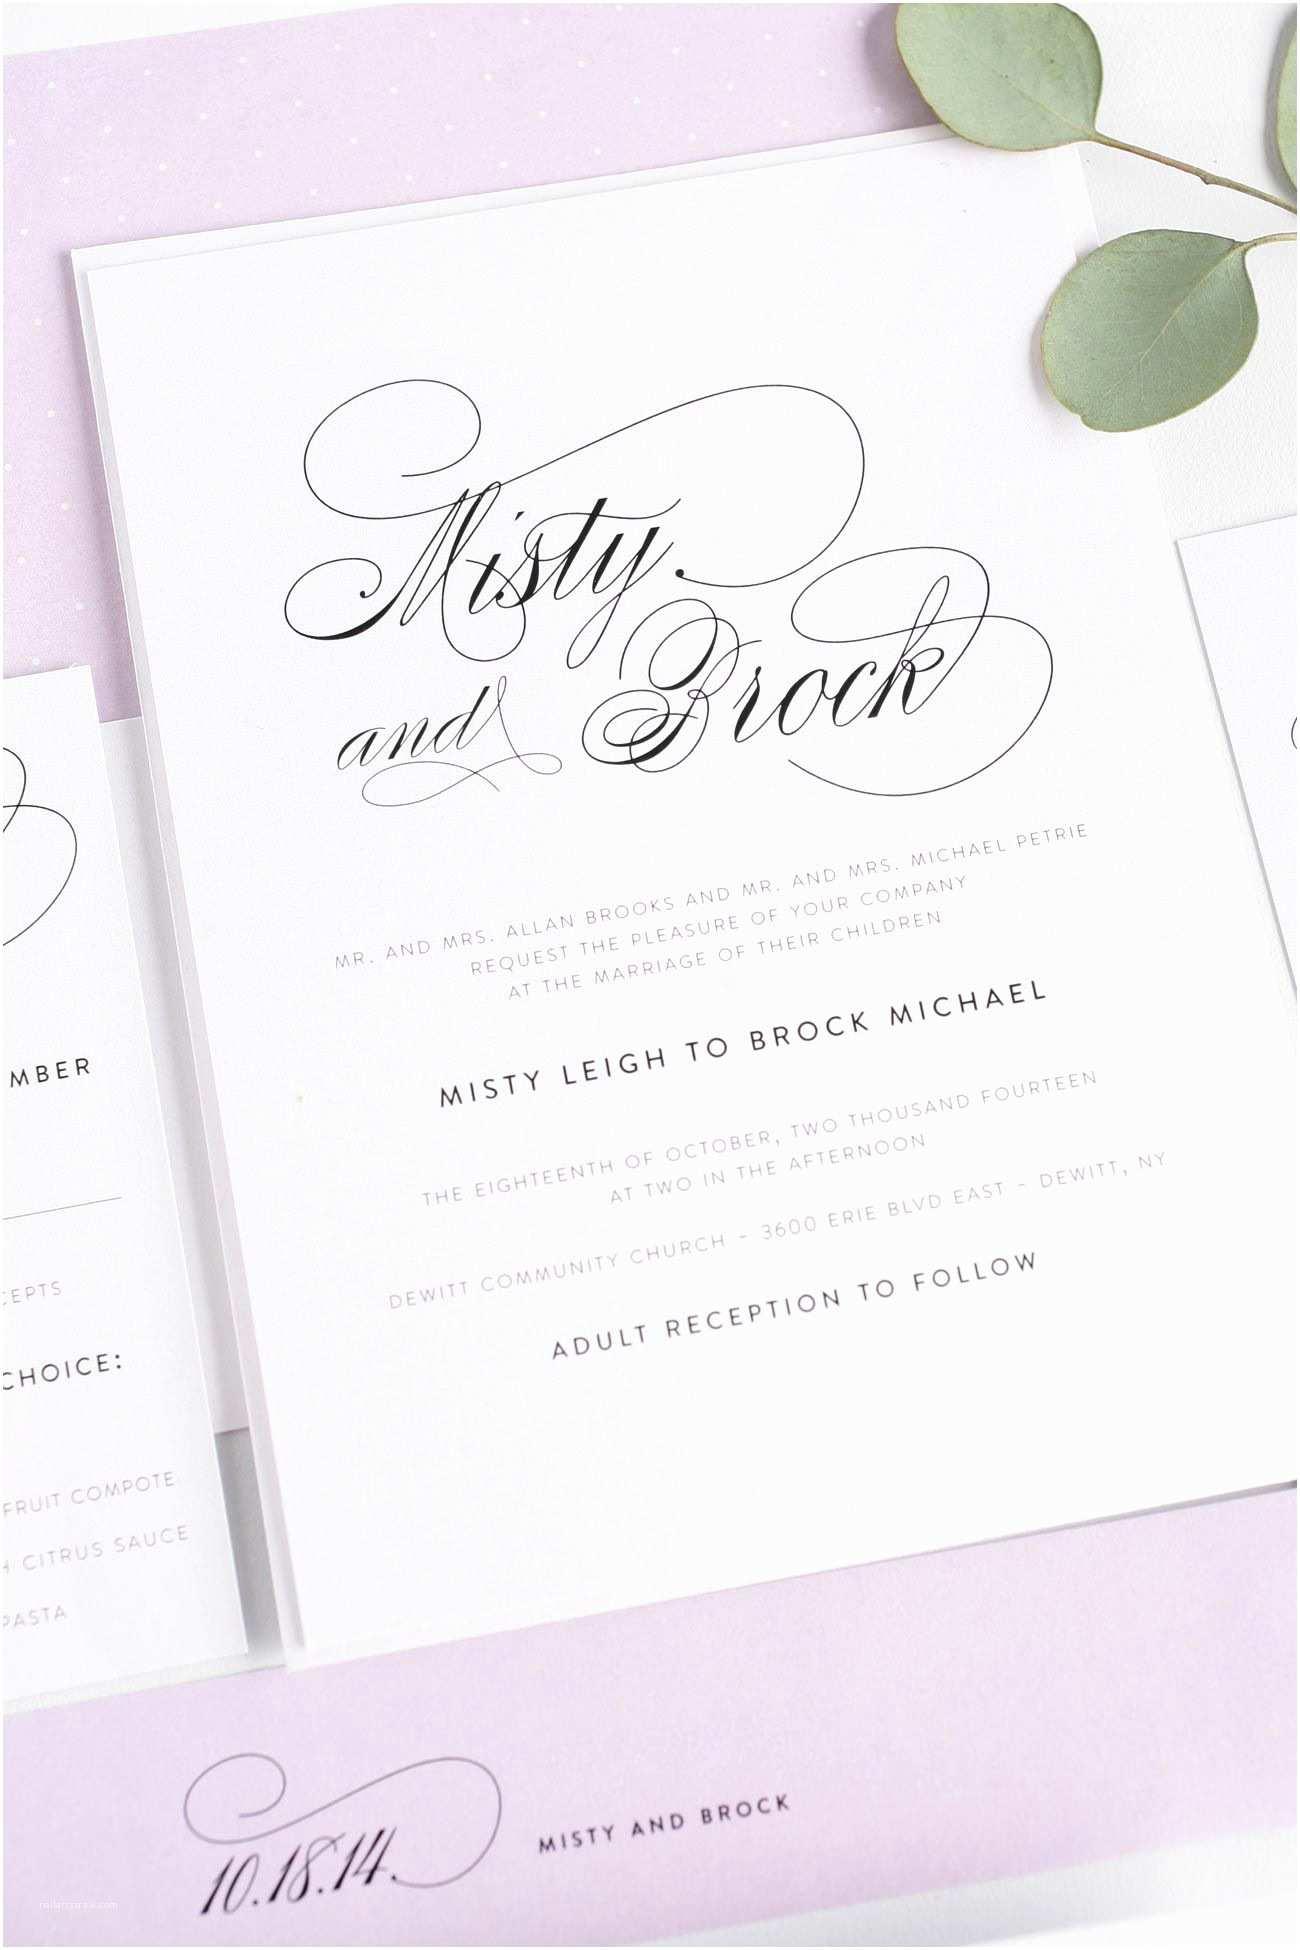 Wedding Invitation Envelope Etiquette Wedding Invitation Envelope Etiquette Wording Yaseen for